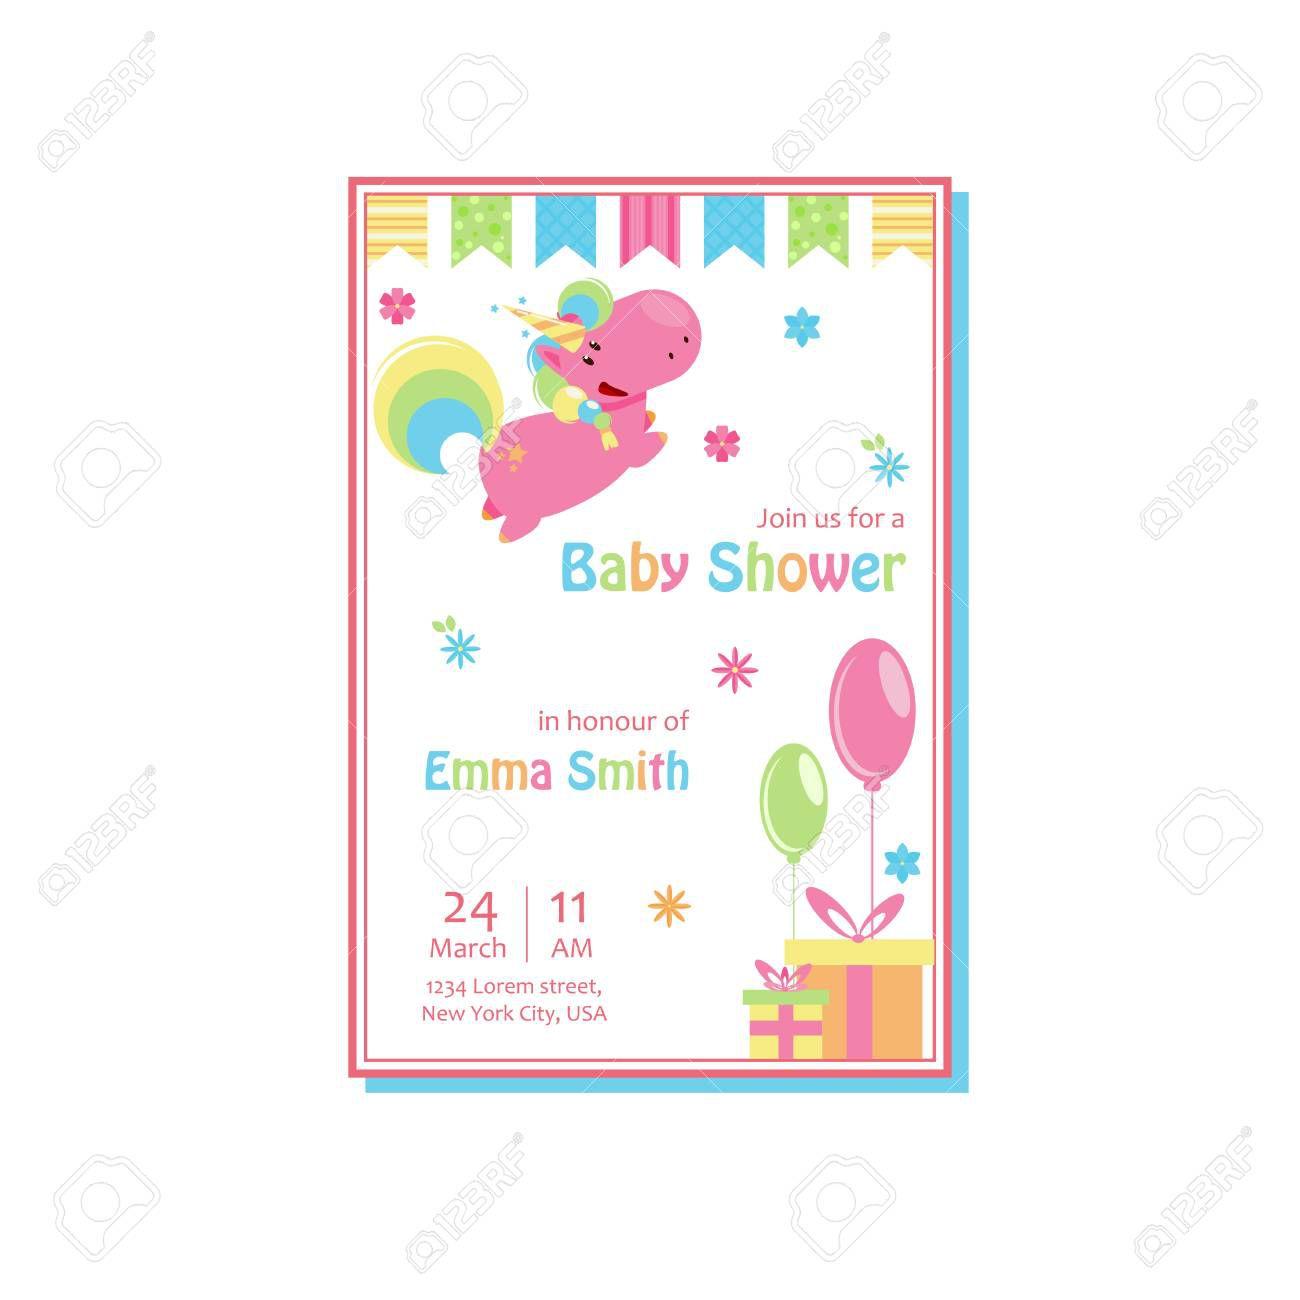 005 Impressive Baby Shower Card Template Sample  Microsoft Word Invitation Design Online Printable FreeFull